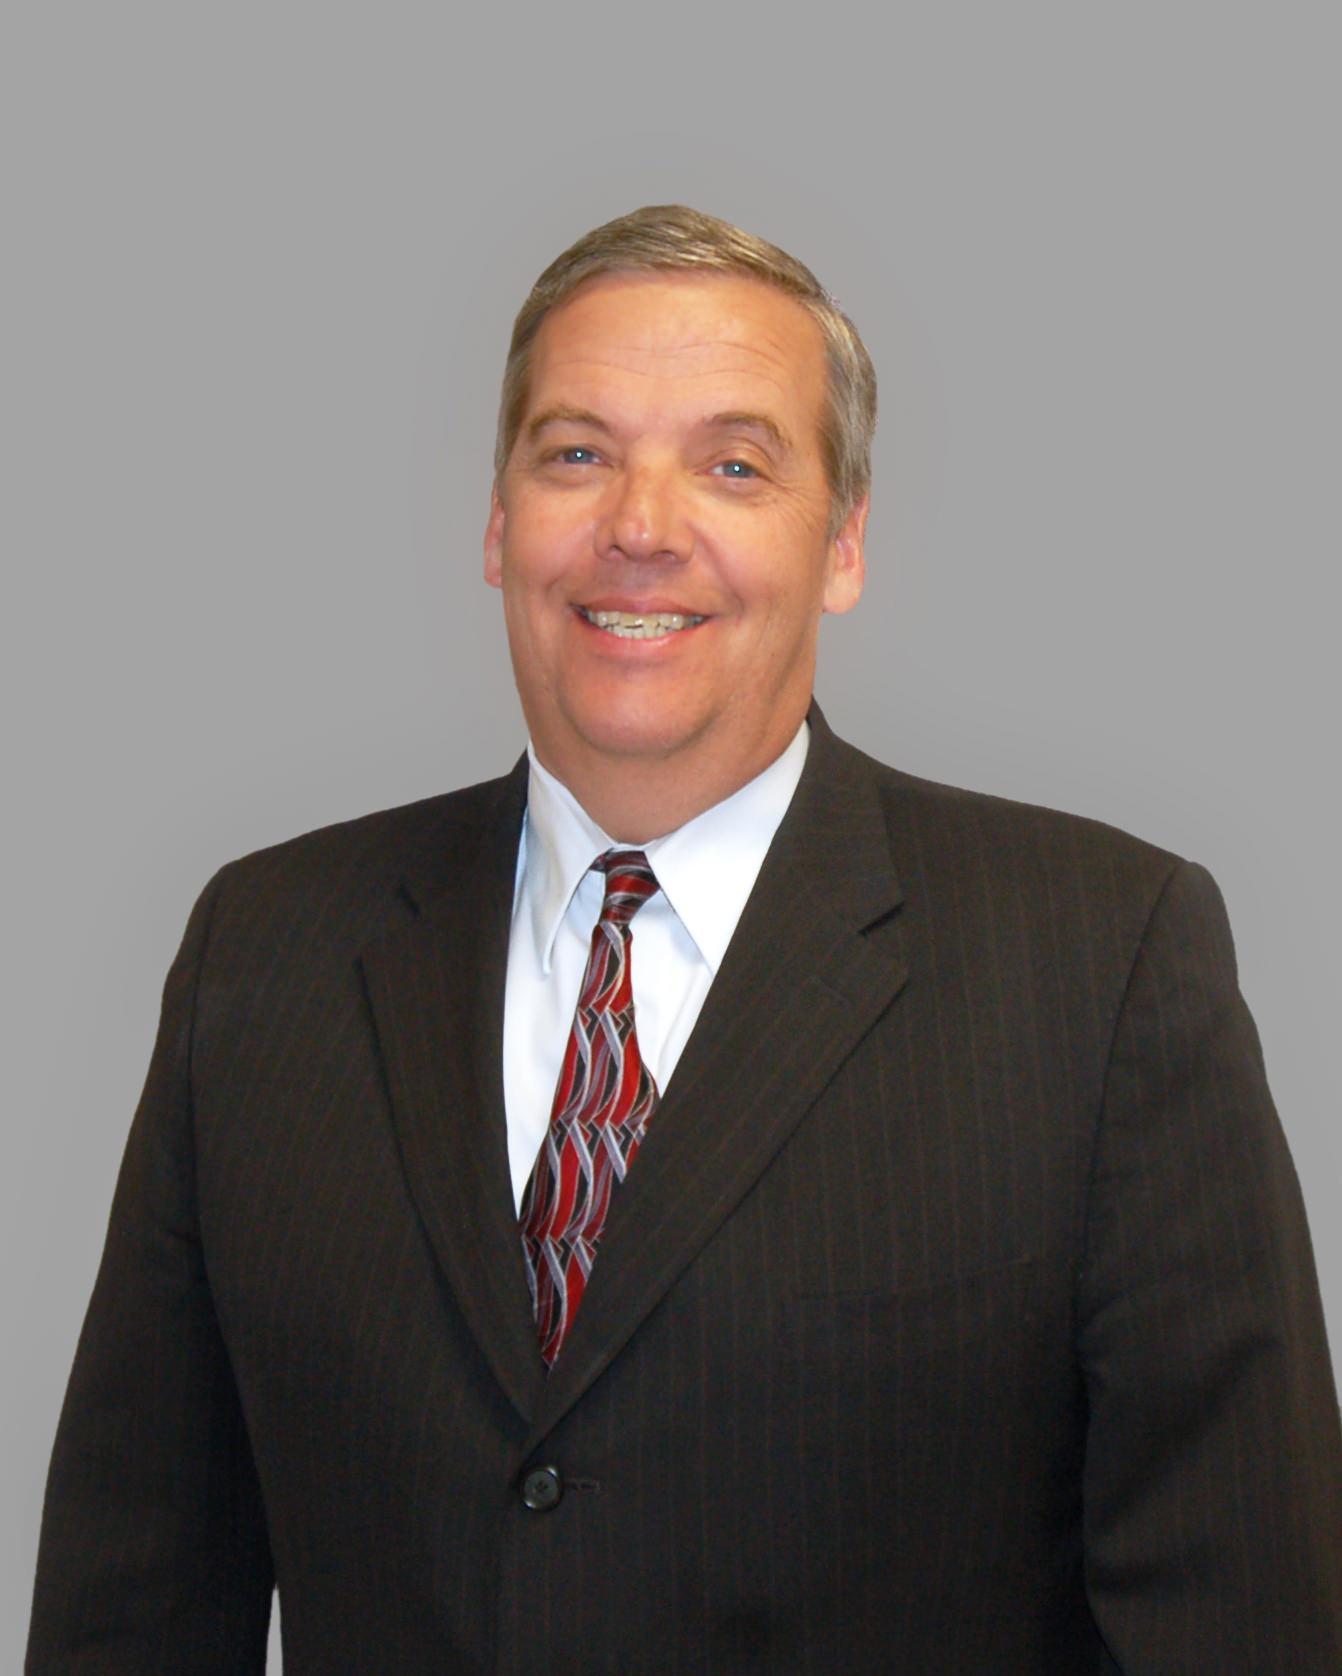 David Wadman - CEO